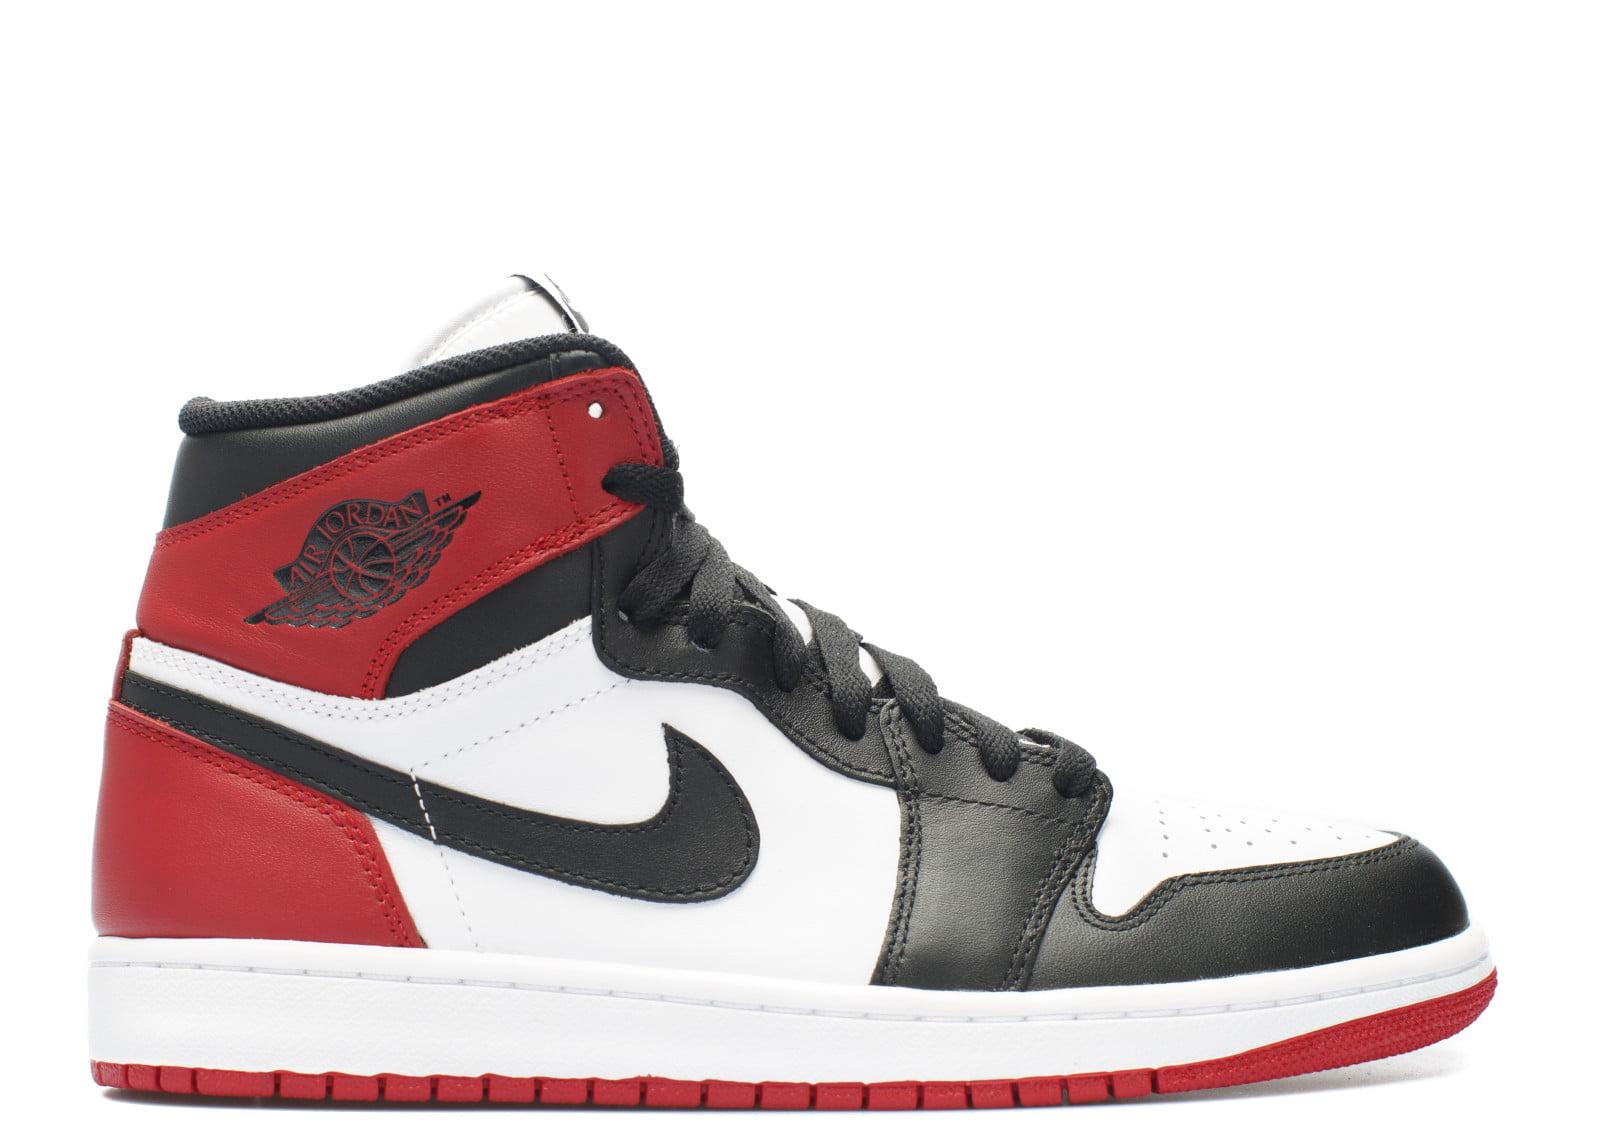 Air Jordan Retro 1 High Og 'Black Toe